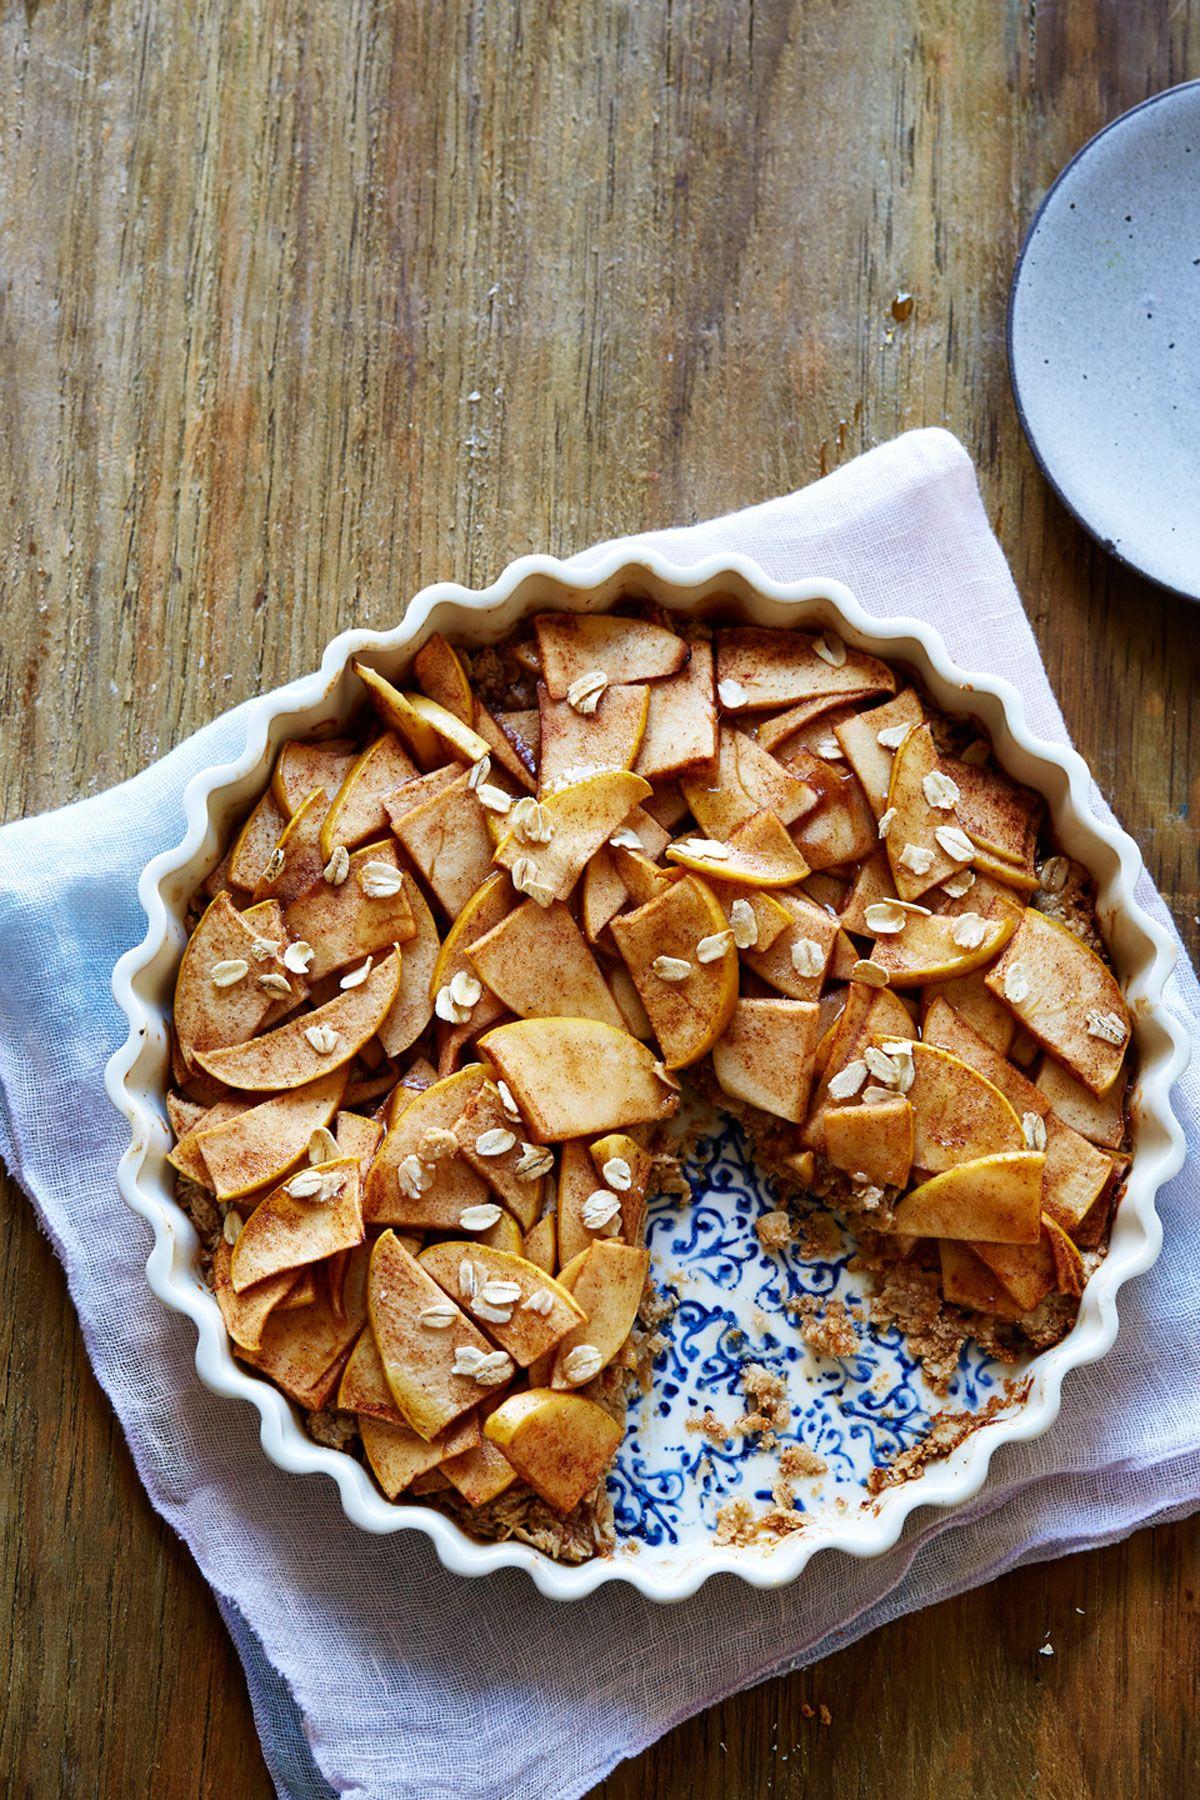 Healthy Apple Tart with Oat & Almond Crust